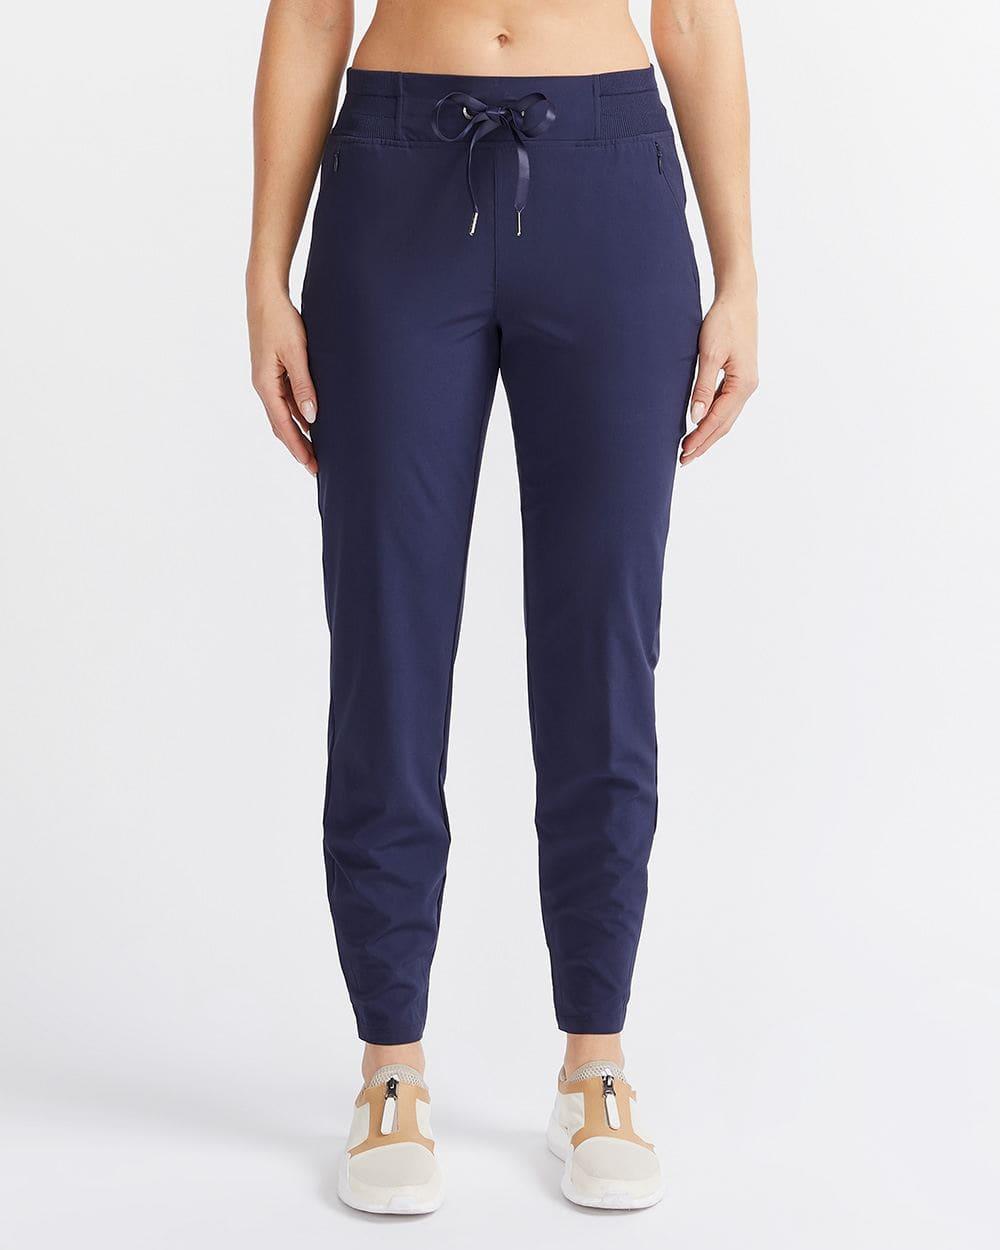 Pantalon de sport côtelé Hyba